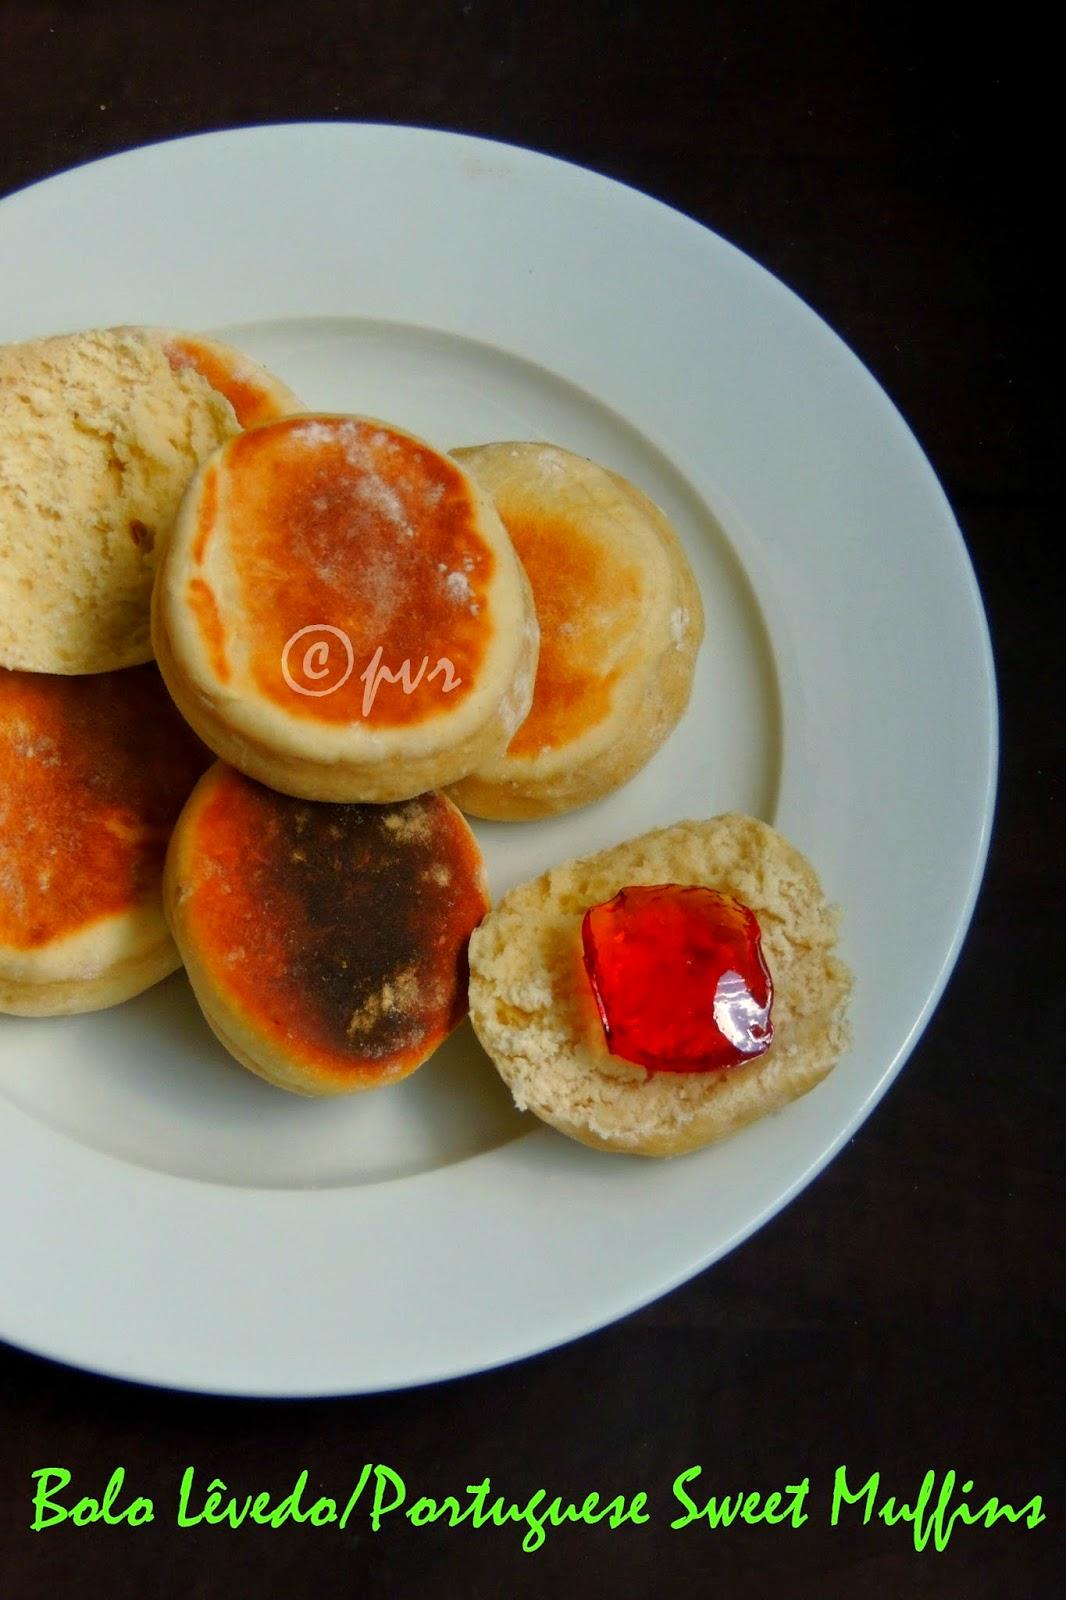 Bolo Lêvedo / Portuguese Sweet Muffins